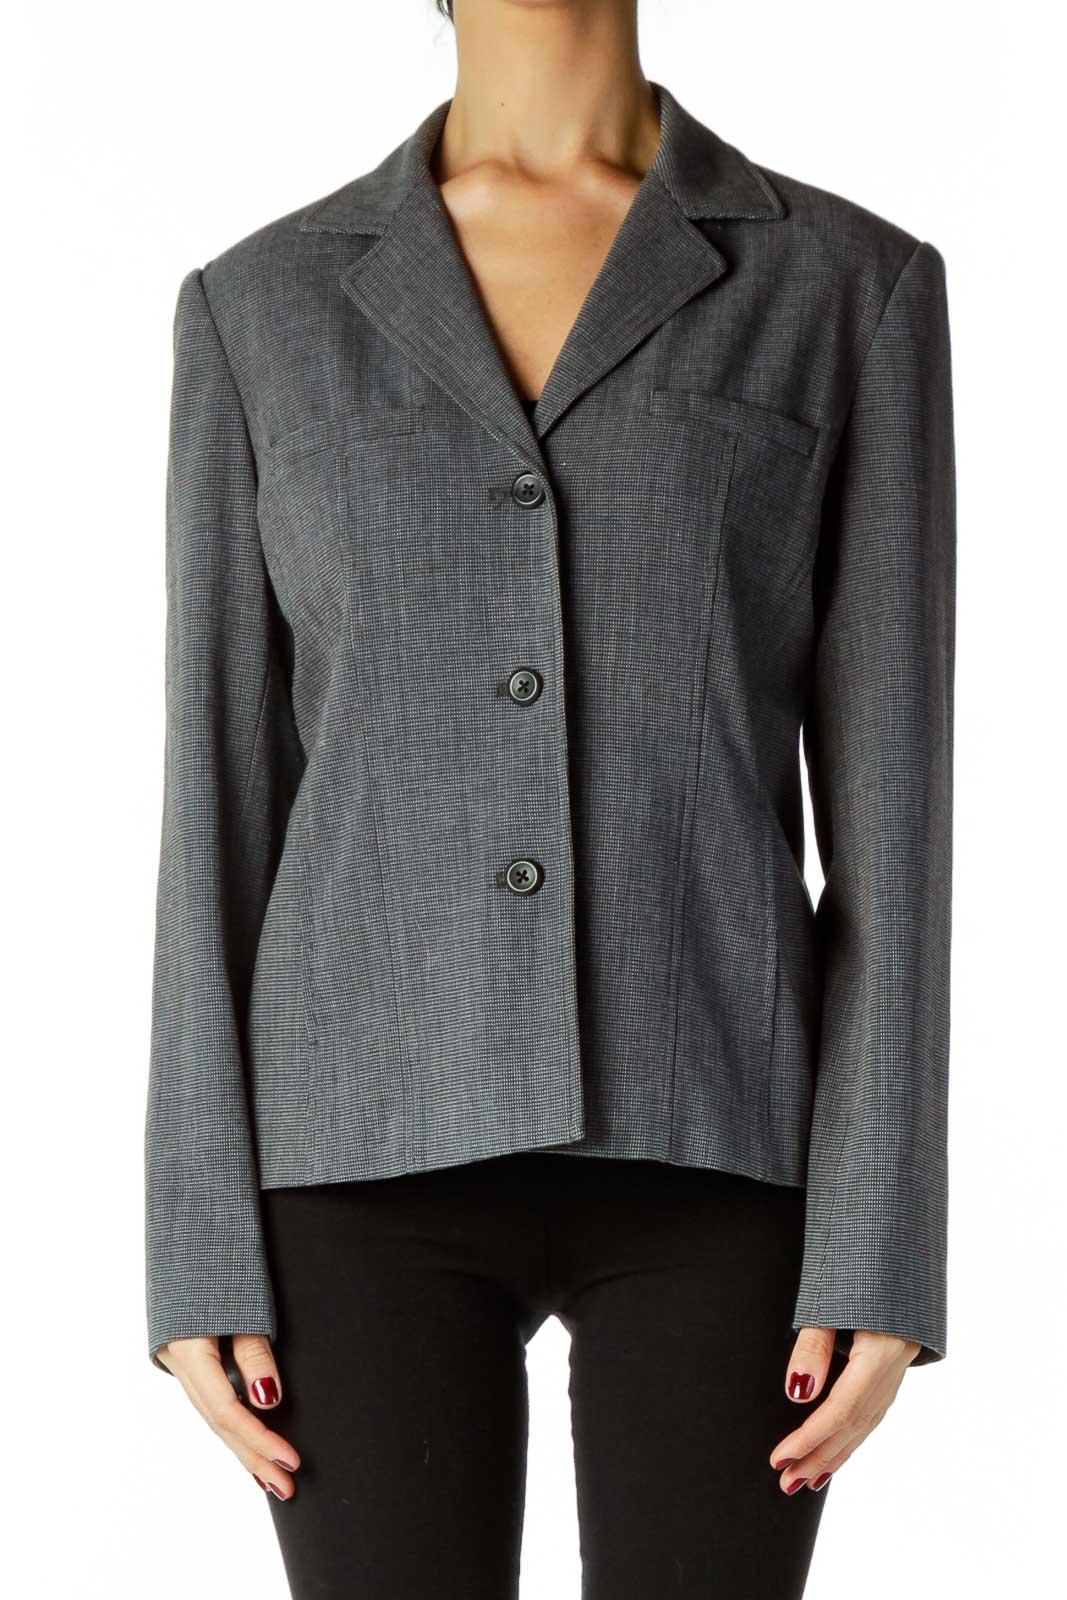 Black Gray Blazer Front